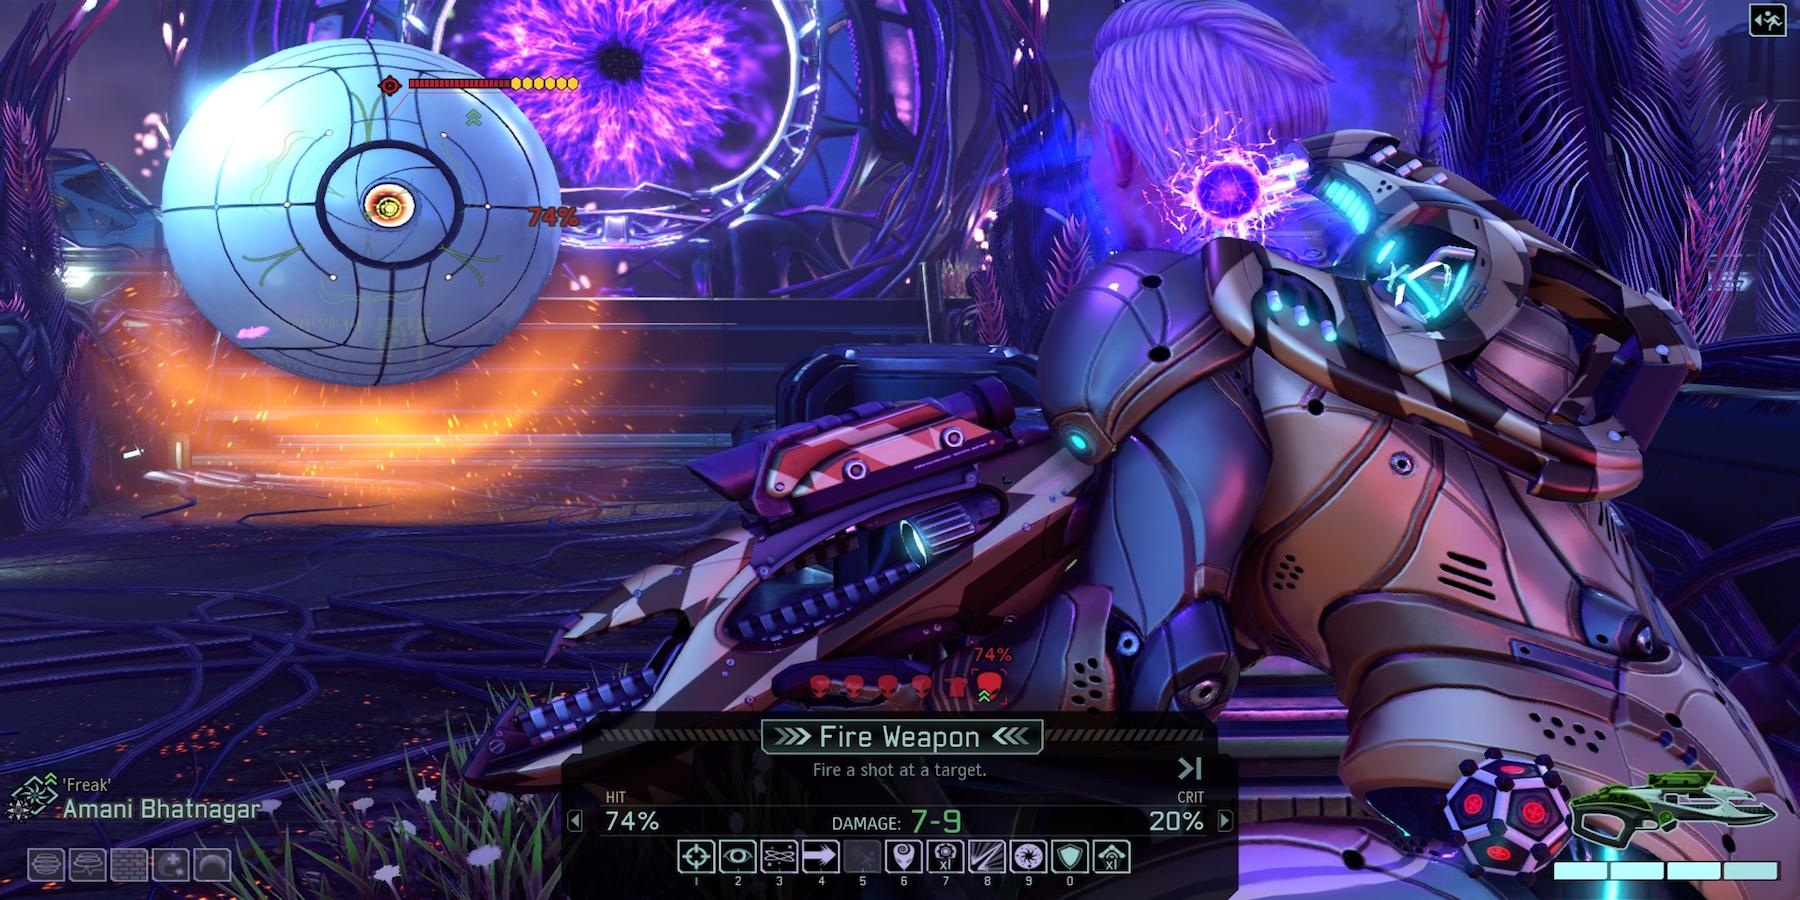 XCOM_2_Review_Screenshots_Tactical_Gatekeeper-2_HUD